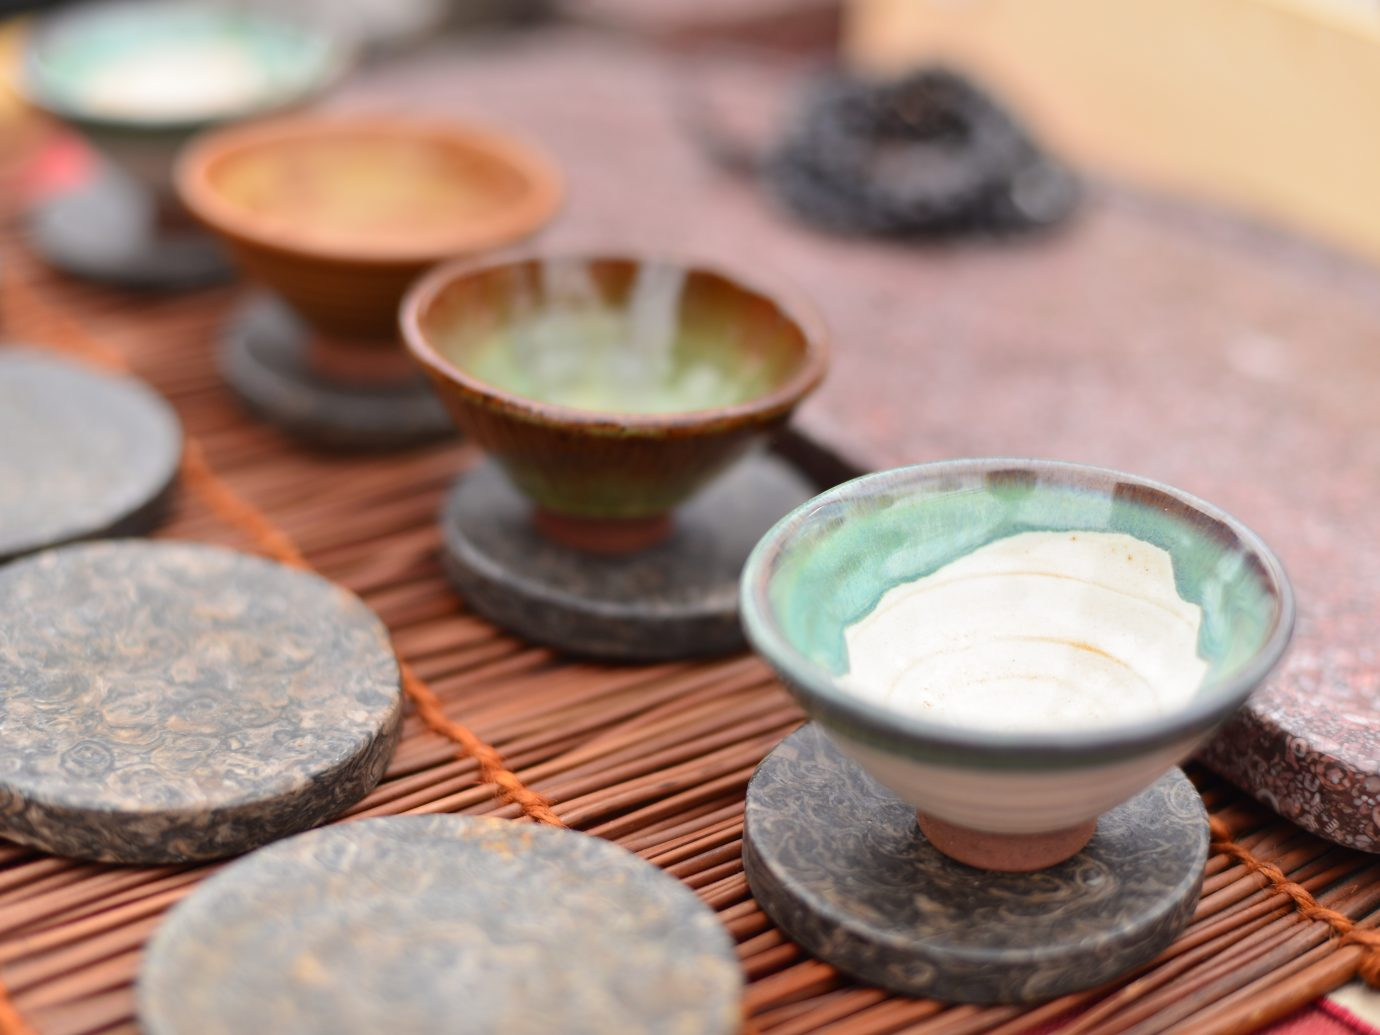 pottery tea set on market stall for sale.